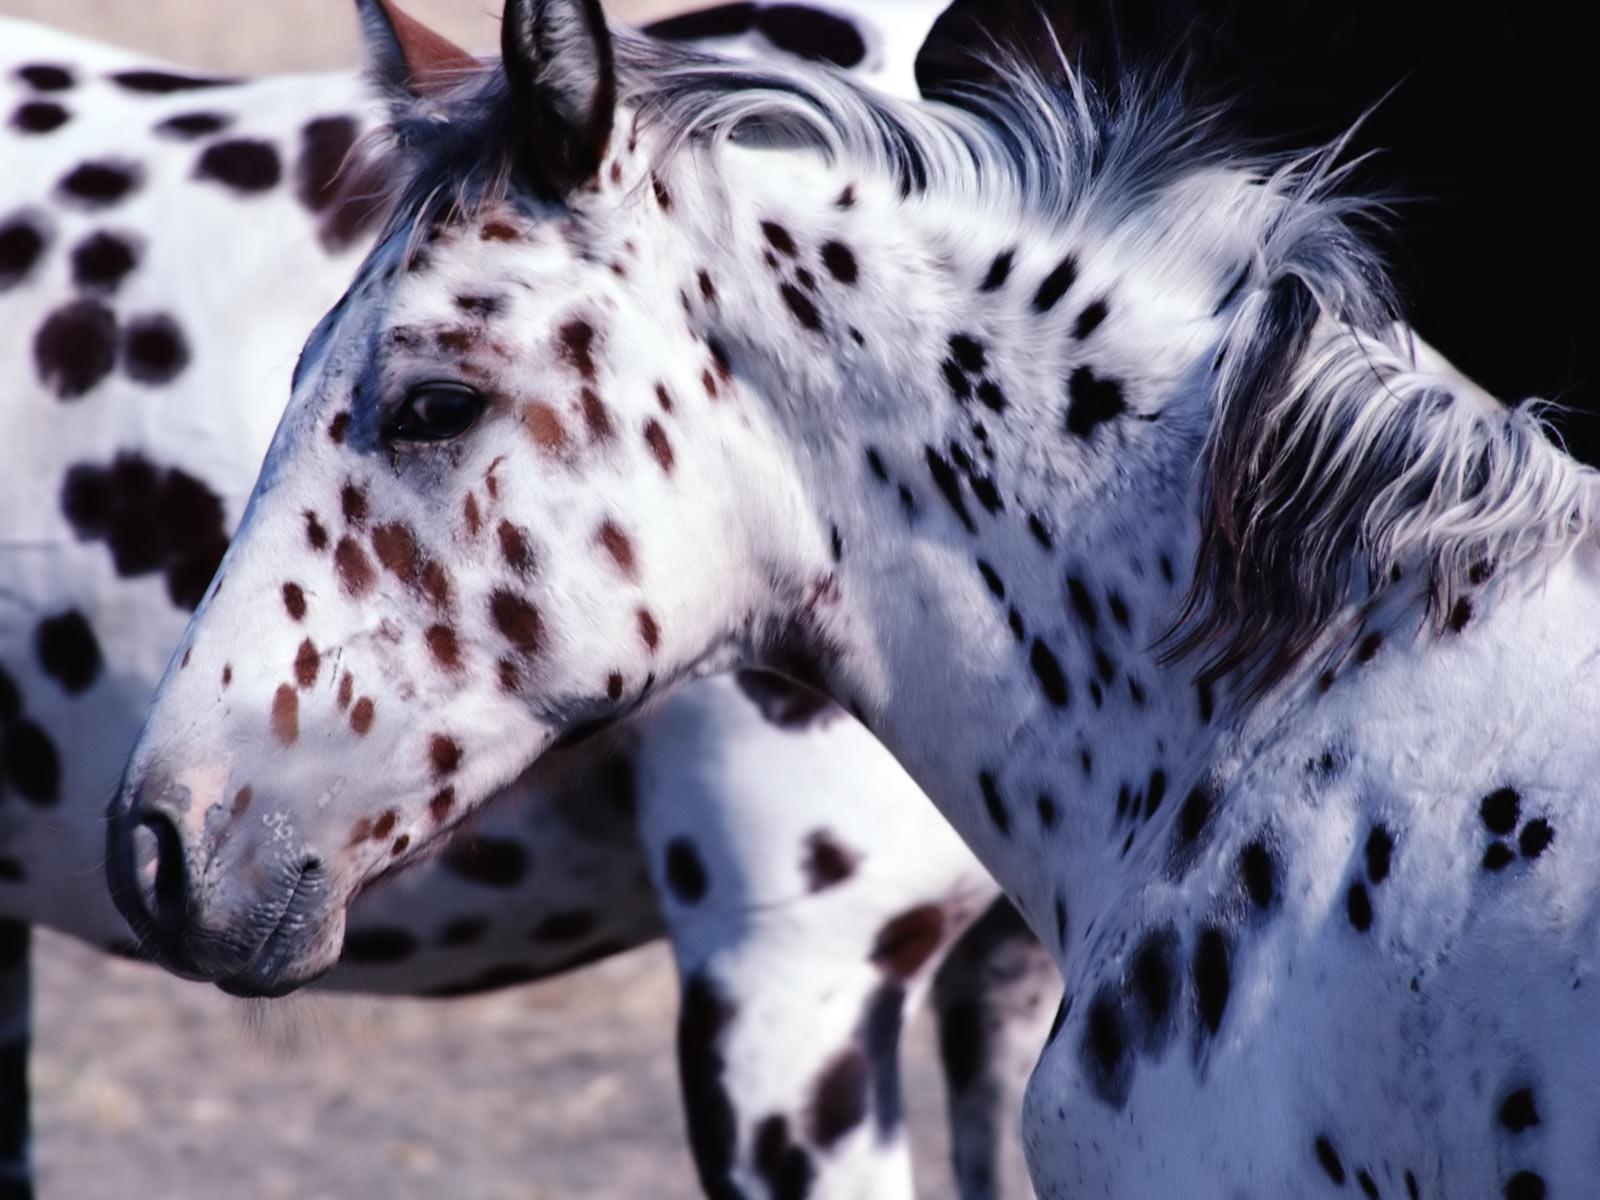 HD Animals Wallpapers Horses Wallpapers for Desktop 1600x1200